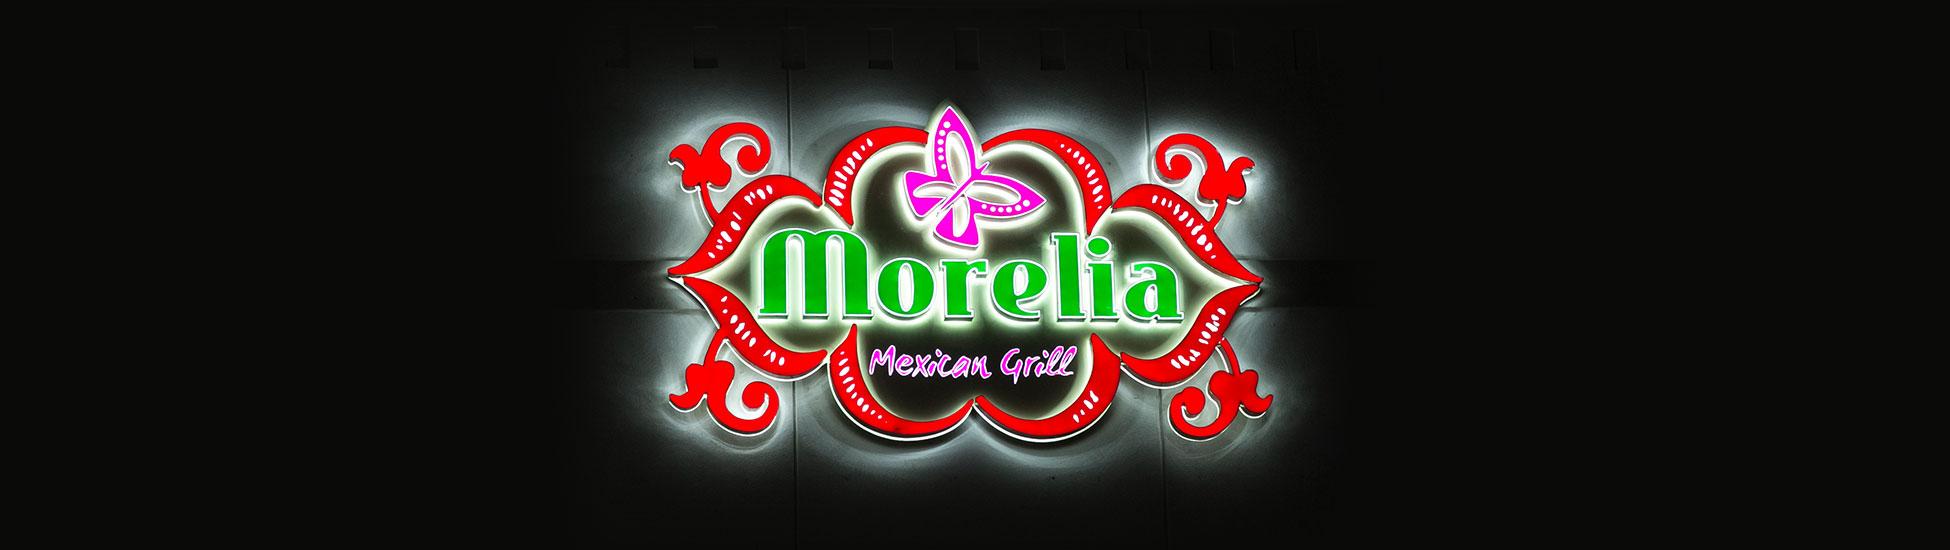 morelia_slide